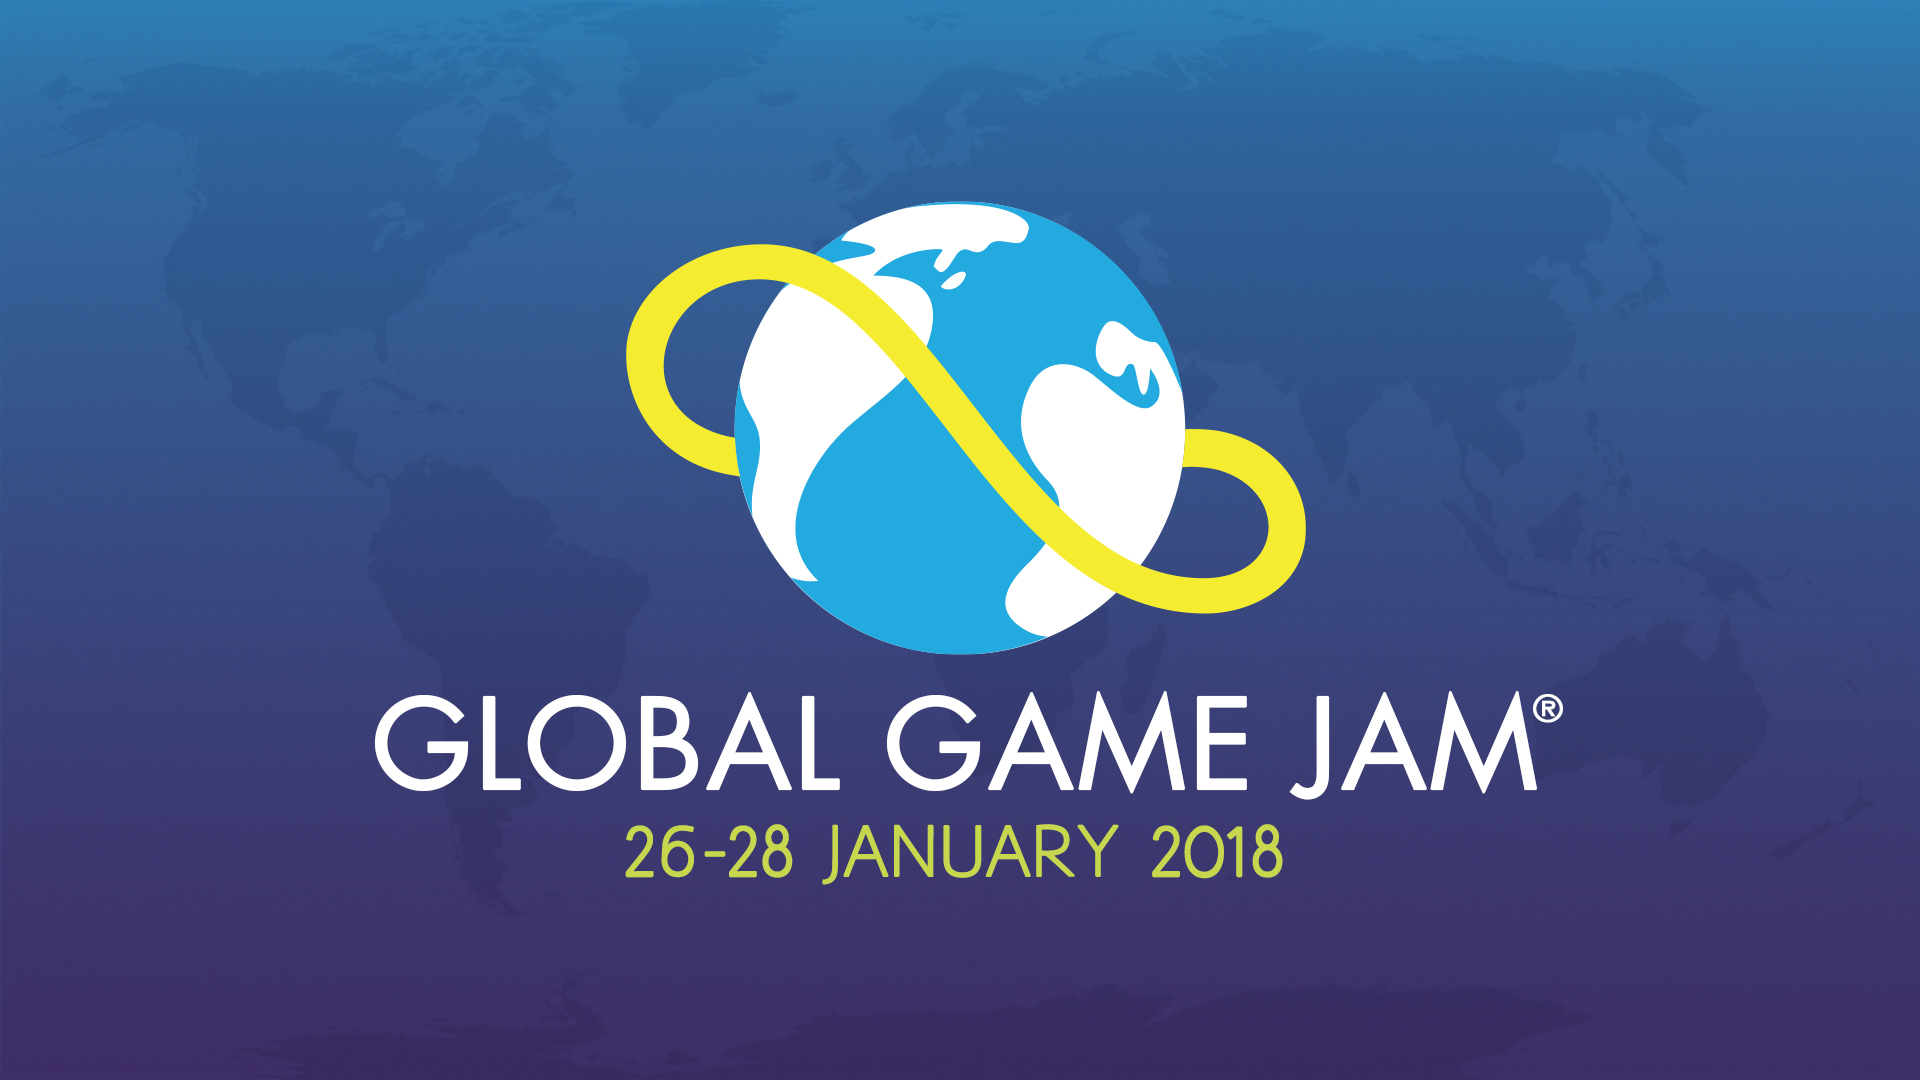 www.globalgamejam.org